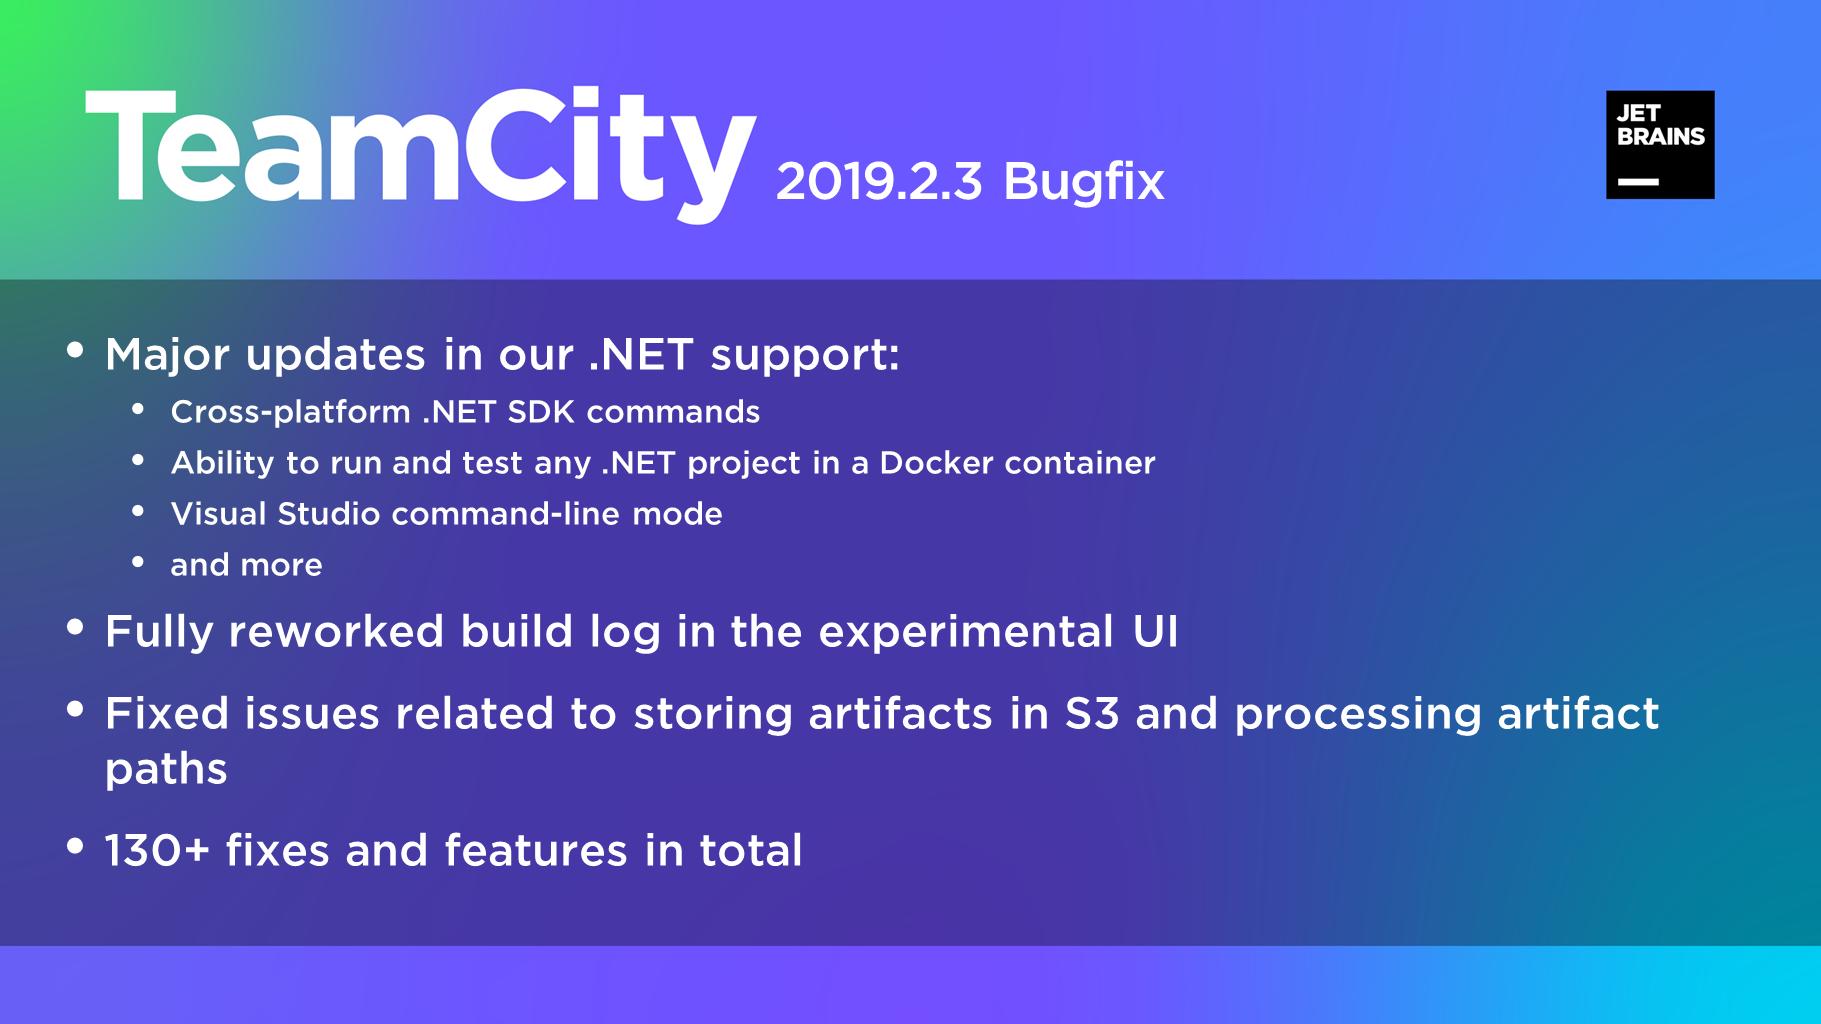 TeamCity 2019.2.3